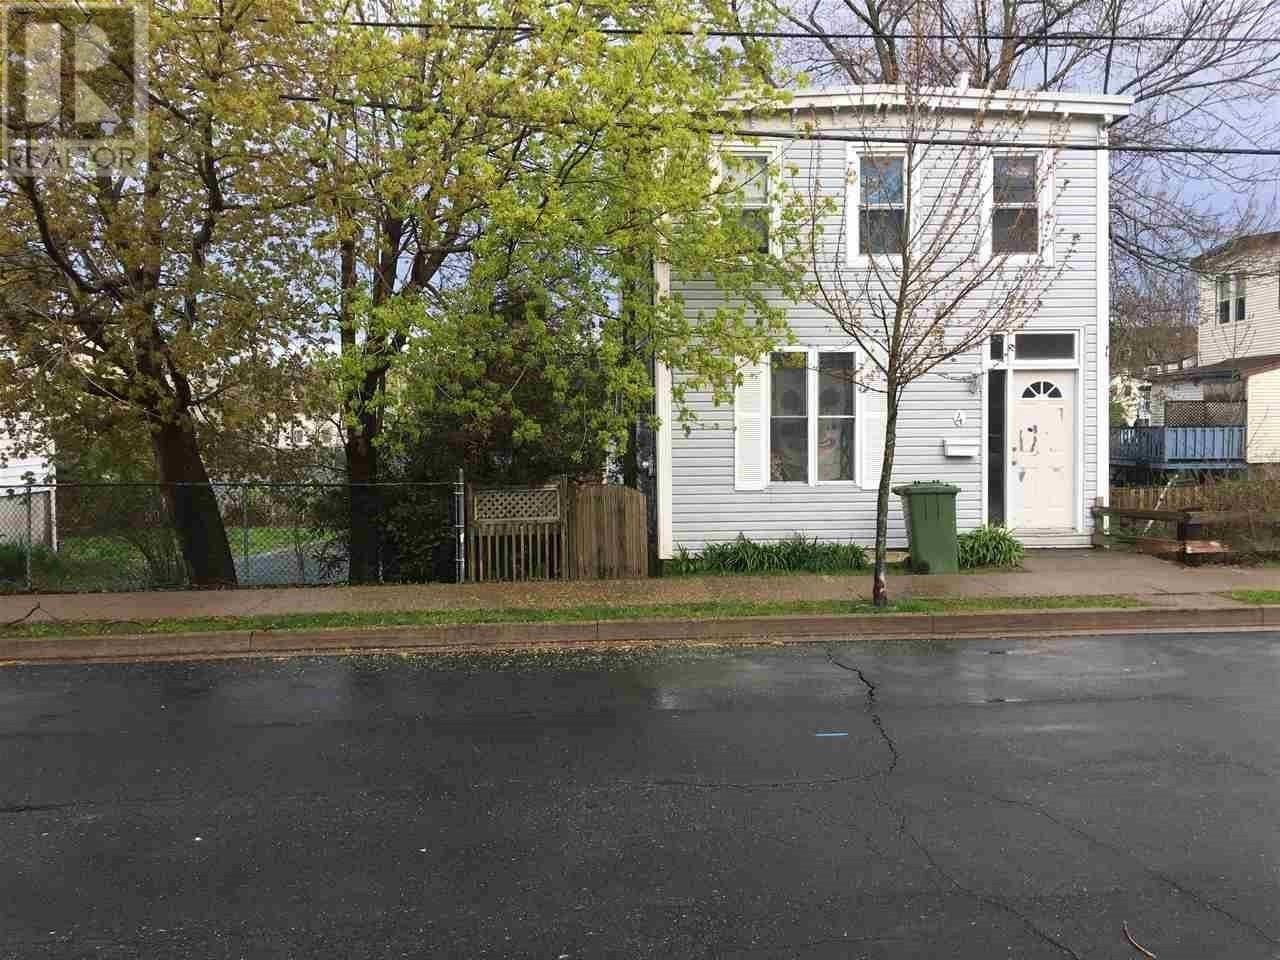 House for sale at 4 Myrtle St Unit 4 Dartmouth Nova Scotia - MLS: 201912364